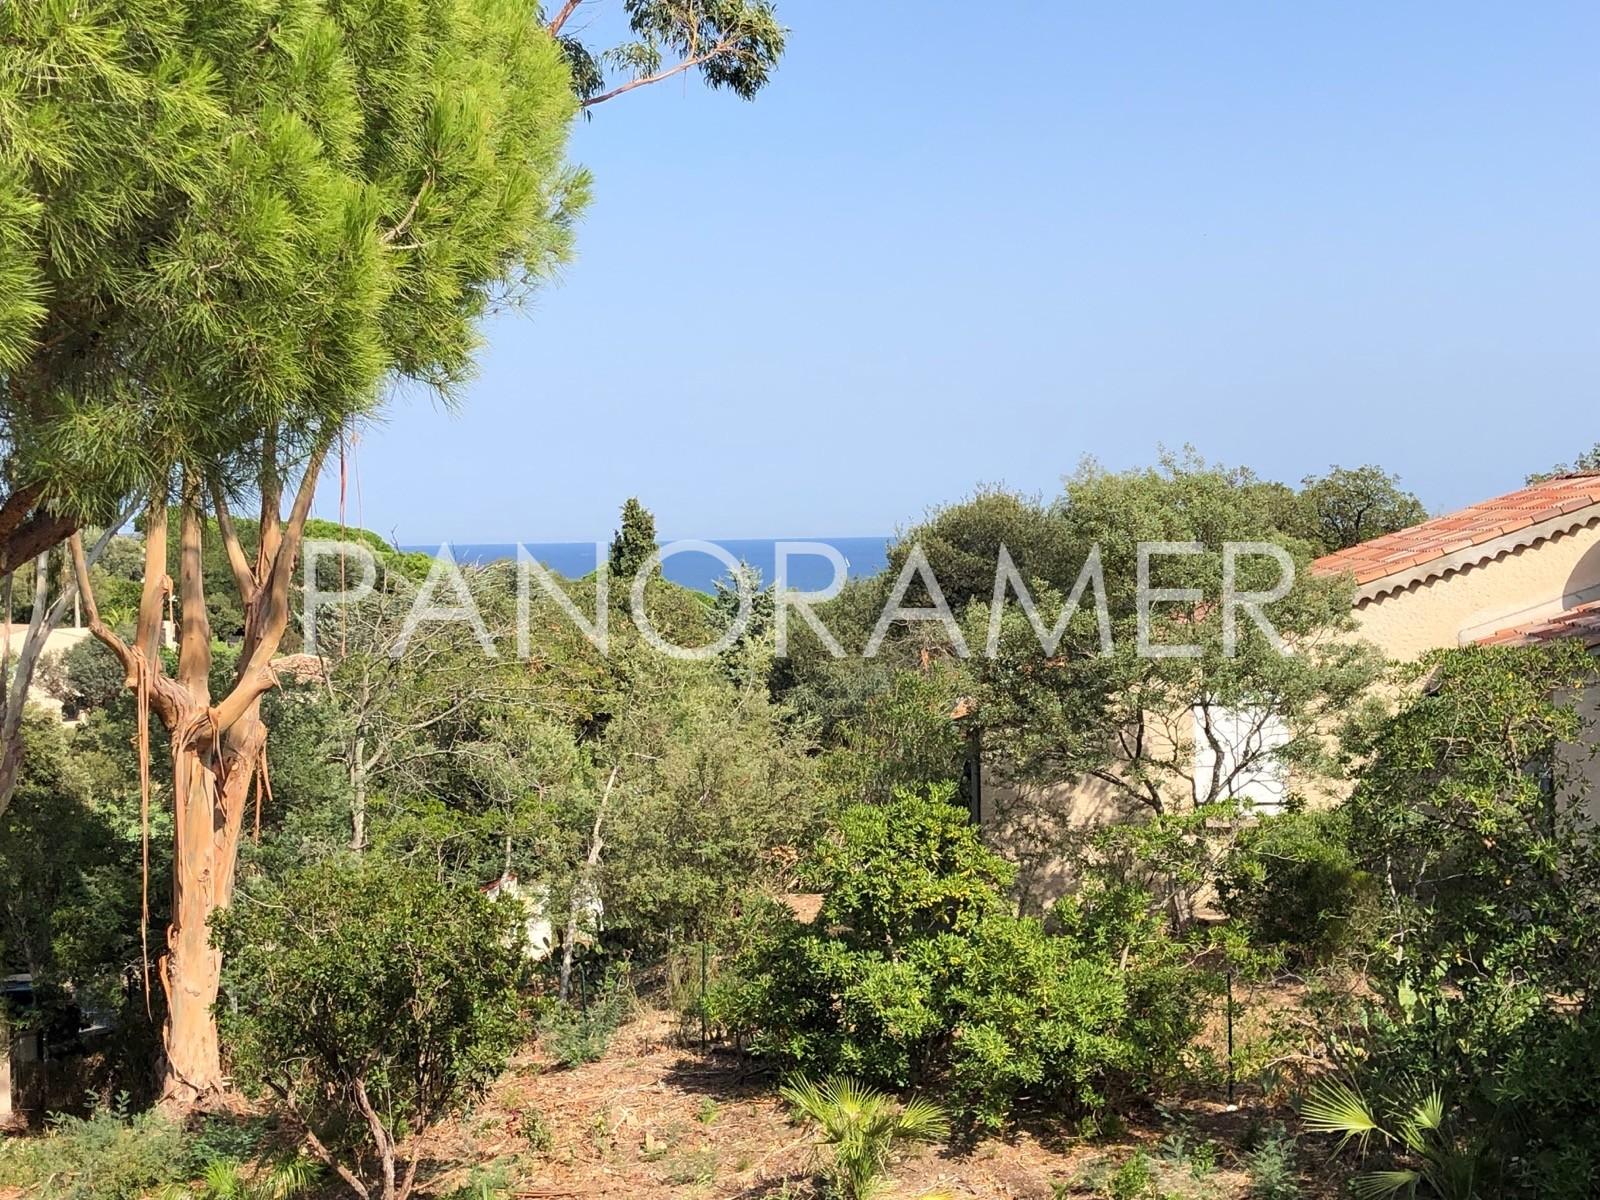 @1600-IMG_4104 Home immobilier Saint Tropez Grimaud Ramatuelle Gassin